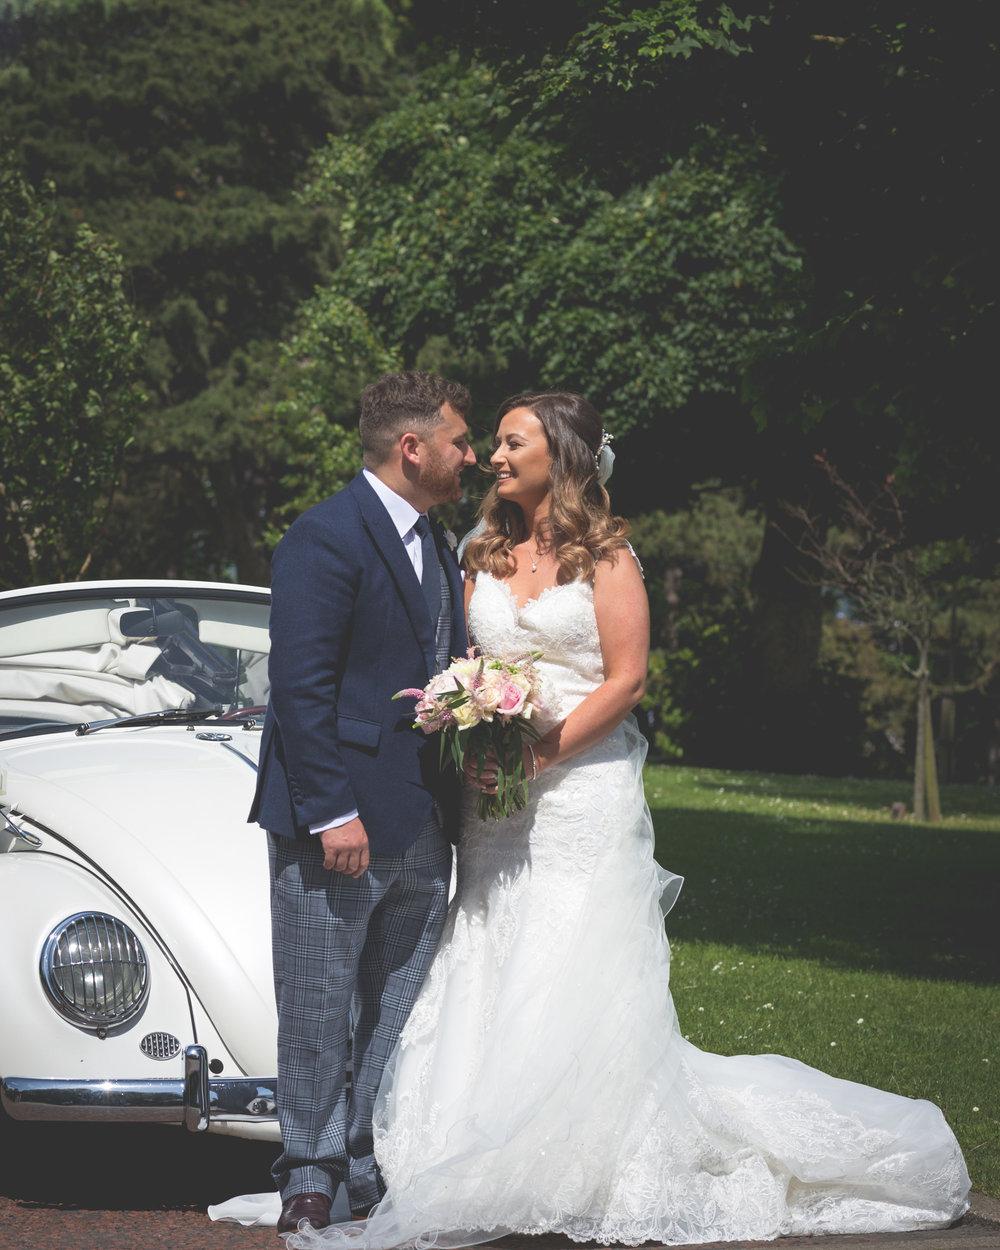 Brian McEwan | Northern Ireland Wedding Photographer | Rebecca & Michael | Portraits-17.jpg